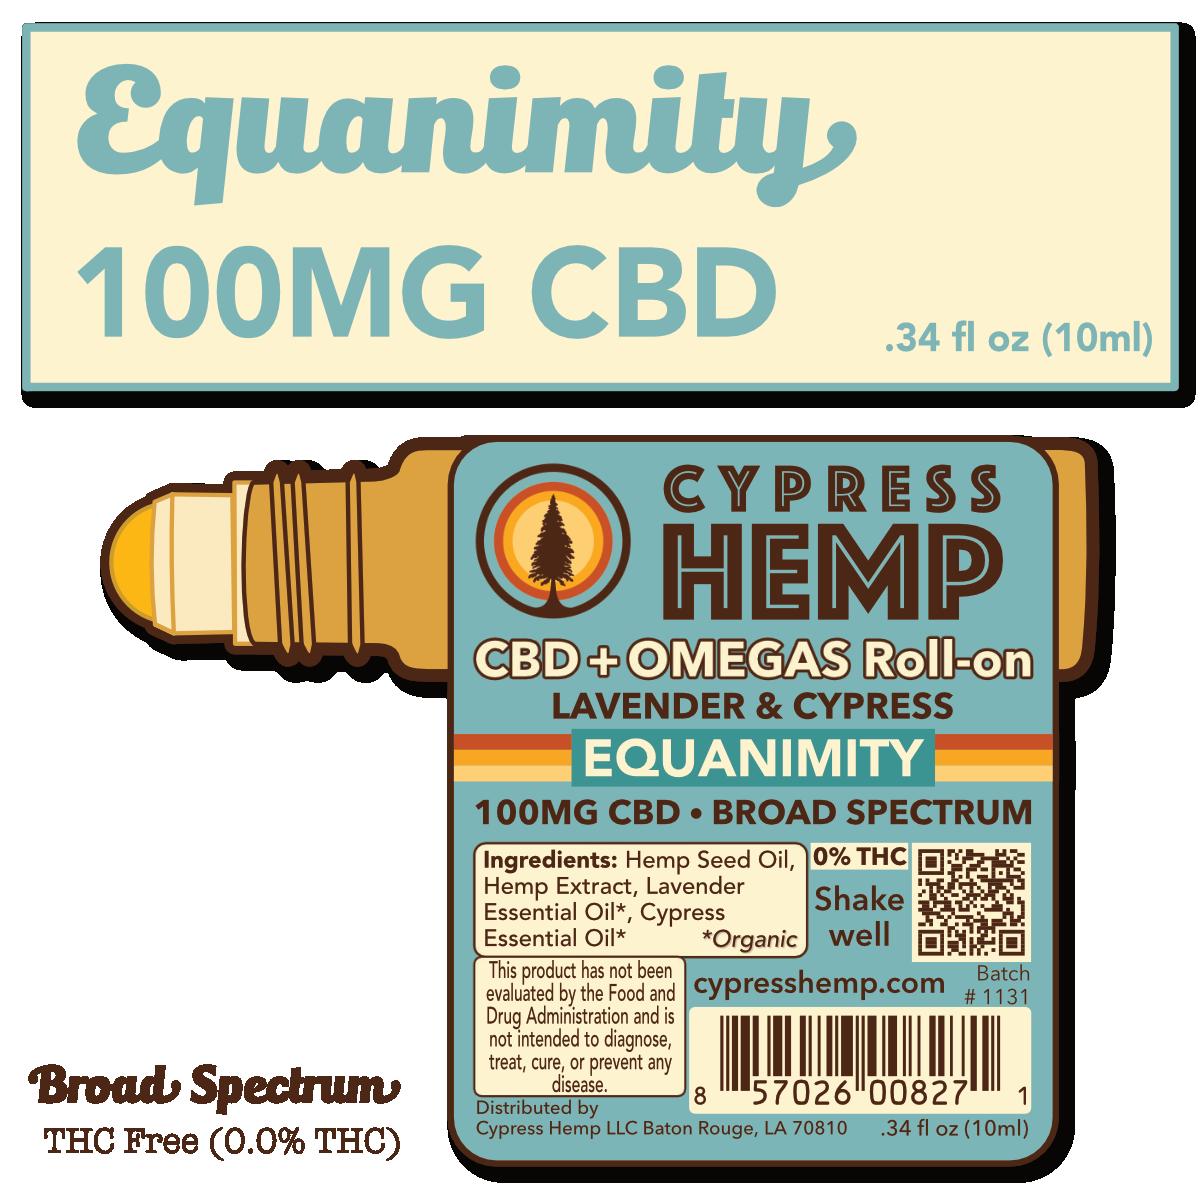 Cypress Hemp Cypress Hemp Broad Spectrum CBD + OMEGAS™ Roll-on - 100mg Lavender & Cypress